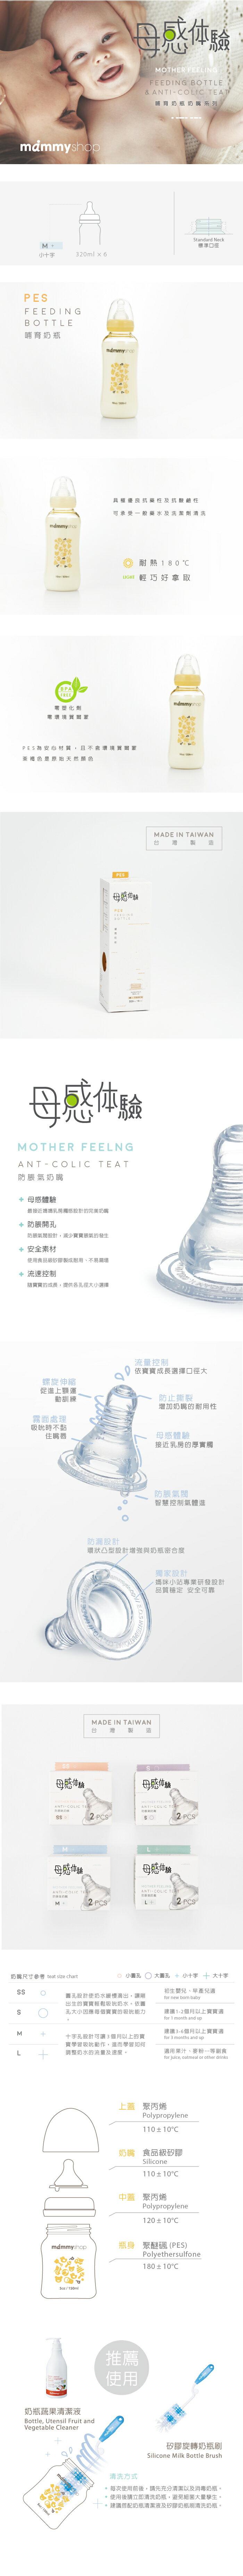 Mammyshop媽咪小站 - 母感體驗 PES防脹氣奶瓶 標準口徑 320ml 6入 超值組 1